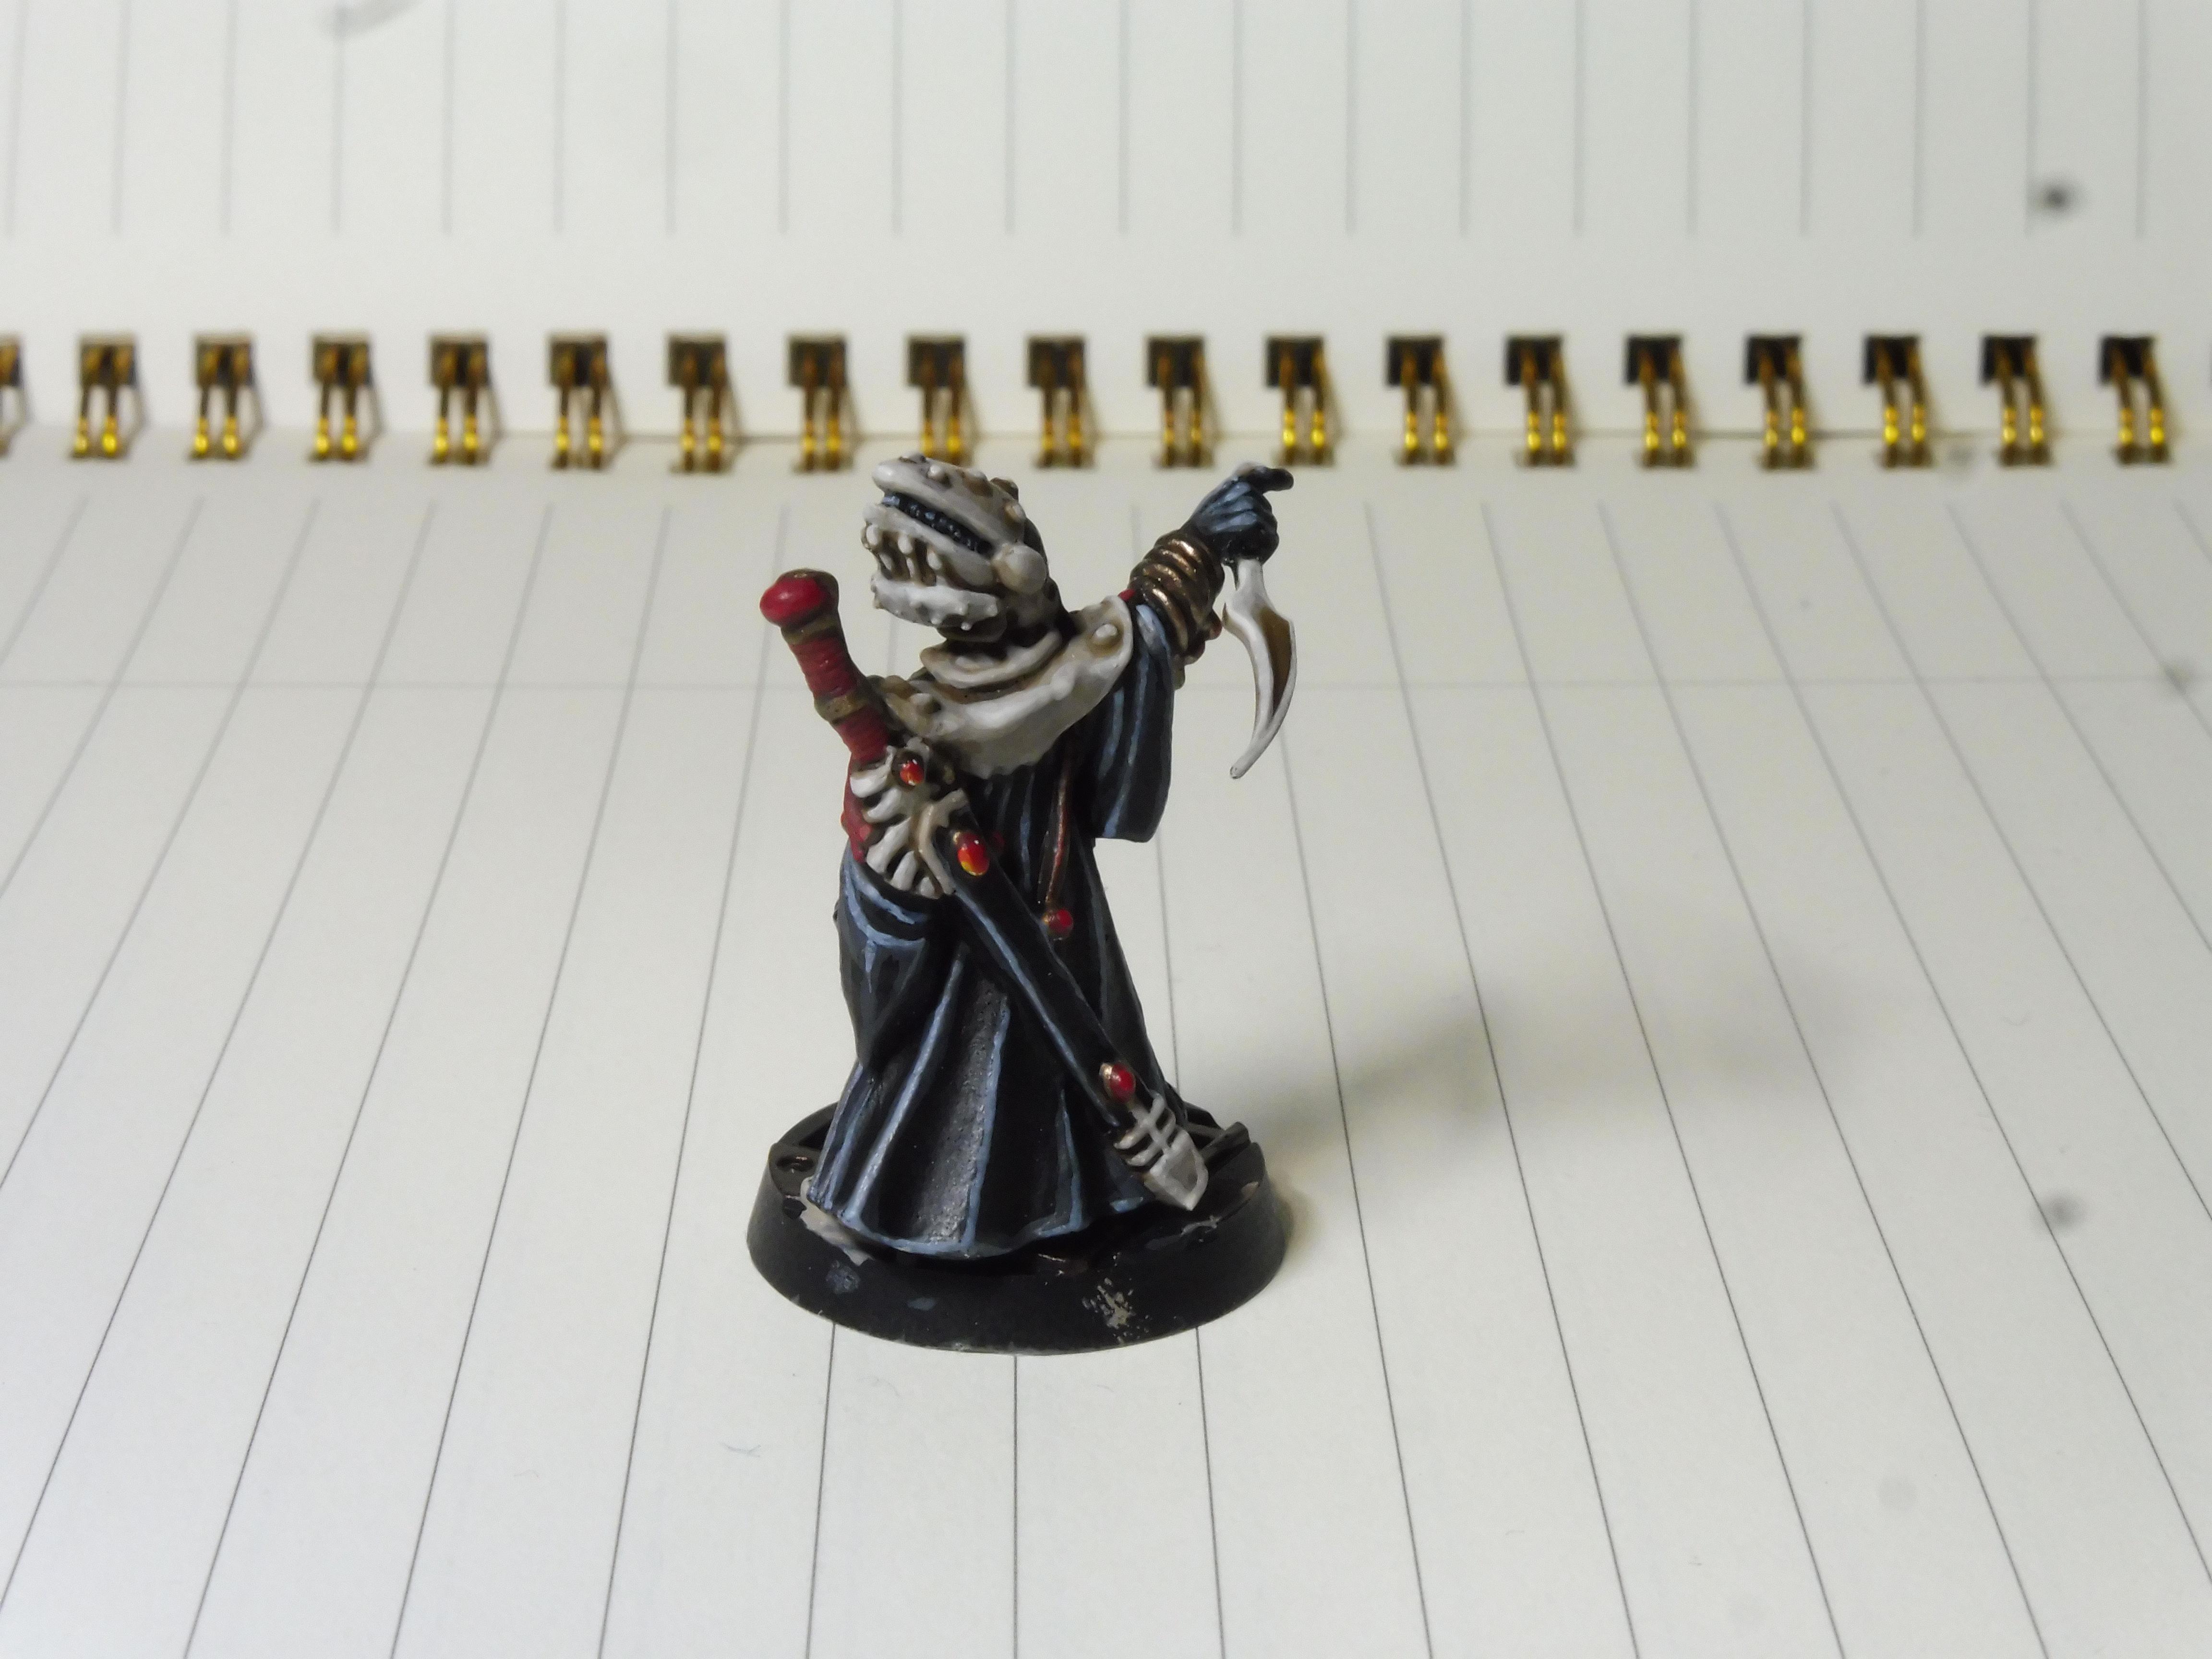 Bone, Custom Paint Scheme, Dark Eldar, Drukhari, Eldar, Ivory, Kabal, Kabalite, Kabalite Warrior, Paint Scheme, Rangers, Splinter Rifle